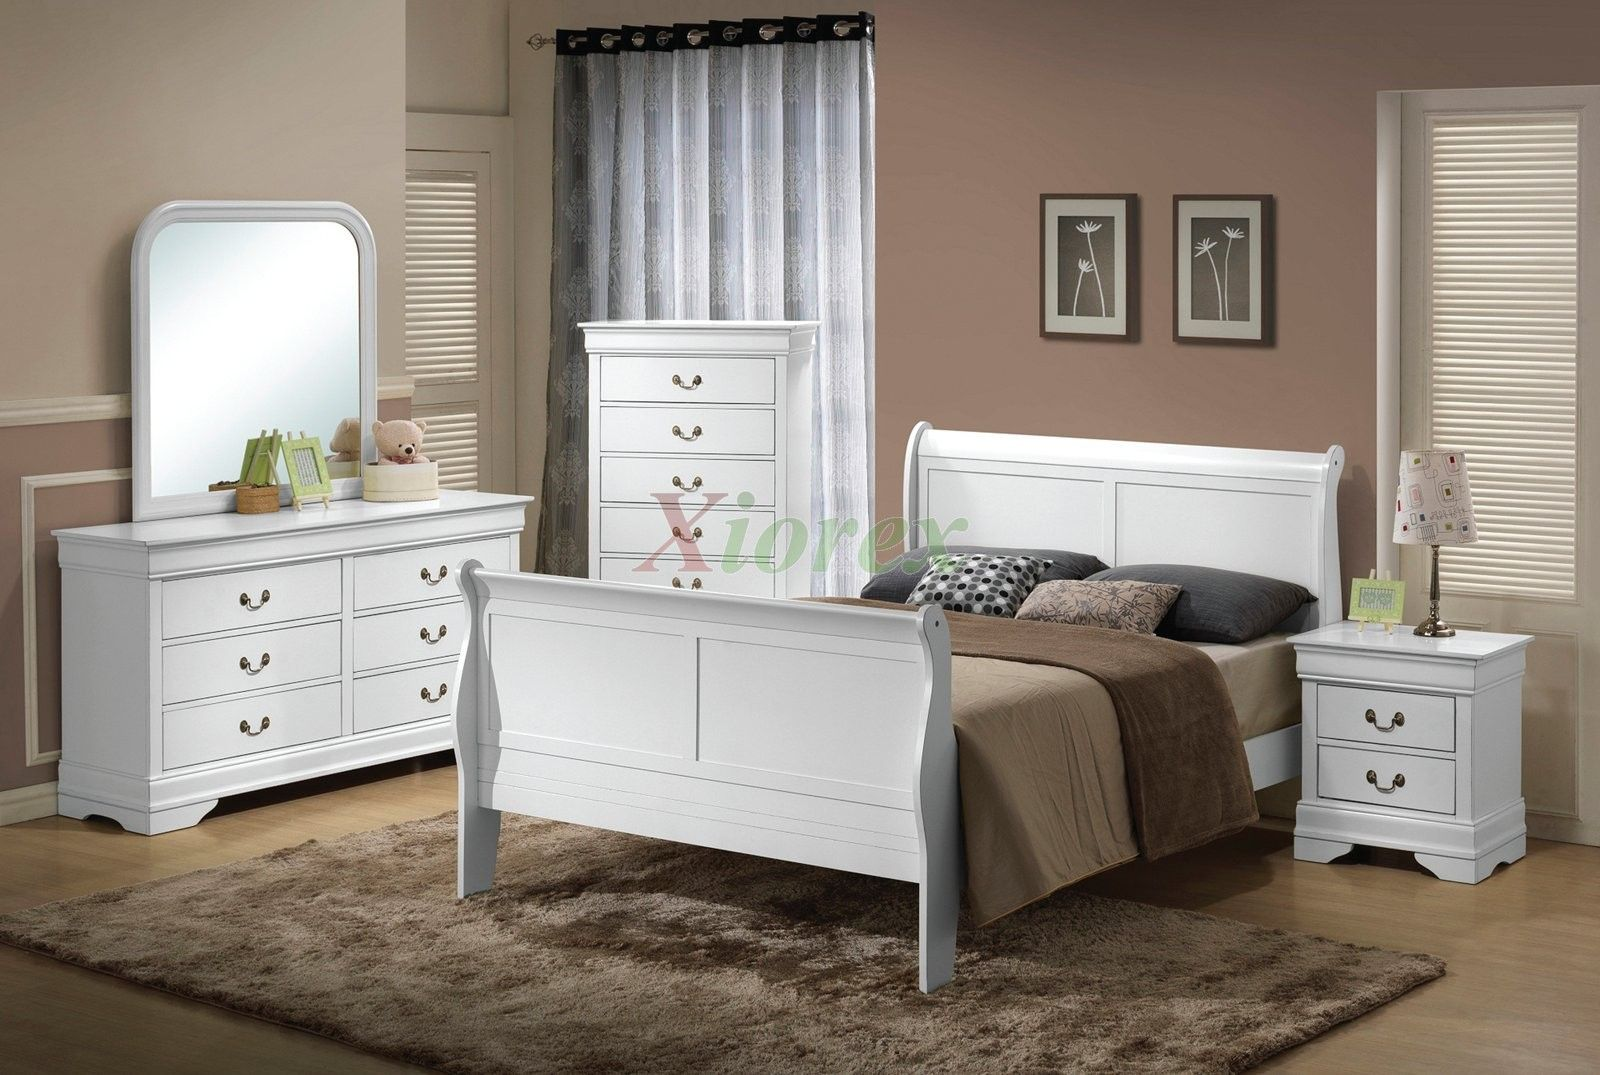 Shaker Style Bedroom Furniture White | Bedroom Furniture | Pinterest ...